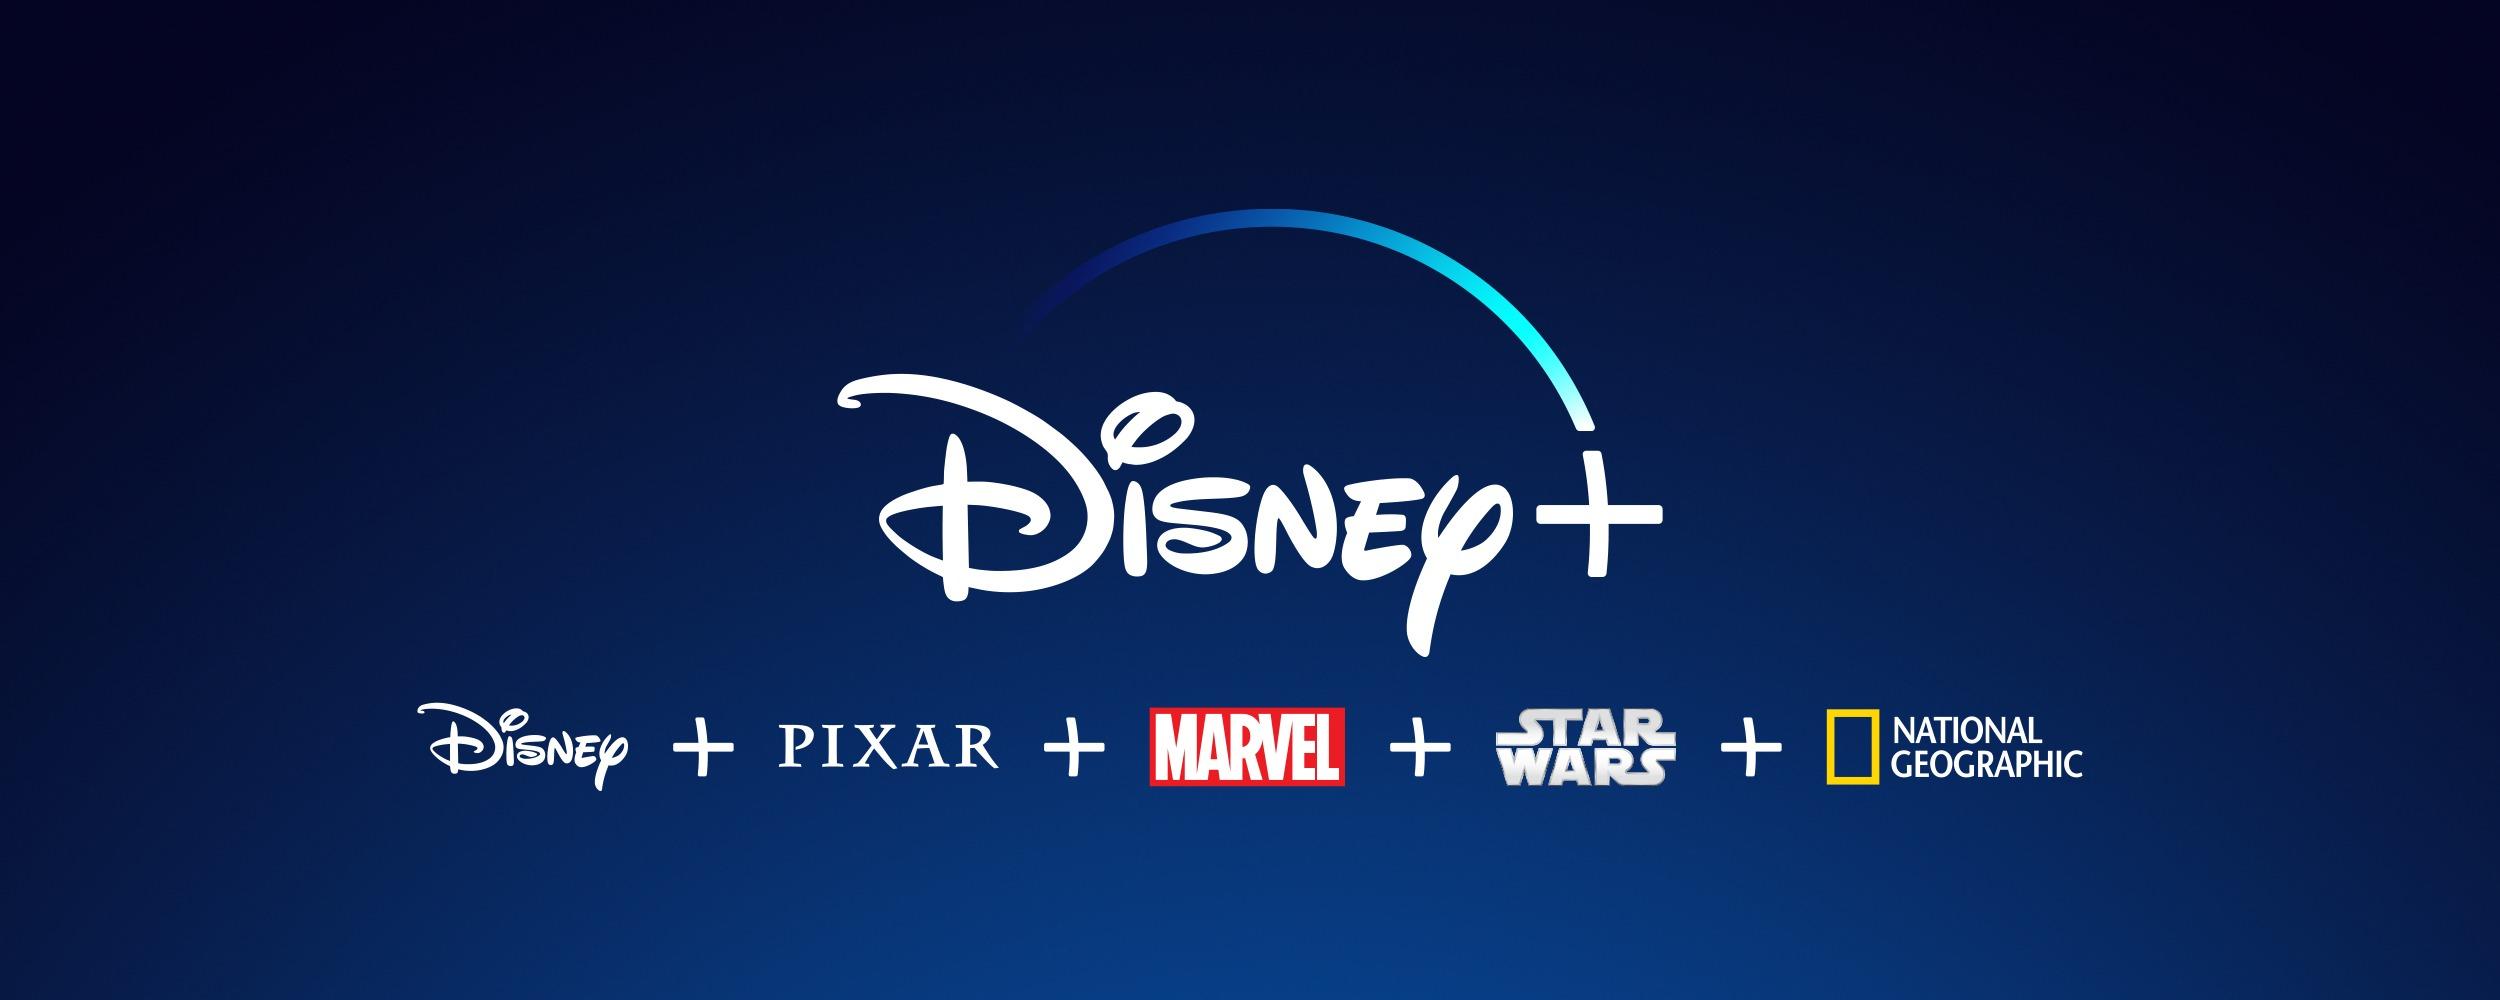 Wonderful misadventures of Disney+: A recap of the streaming giant's first week